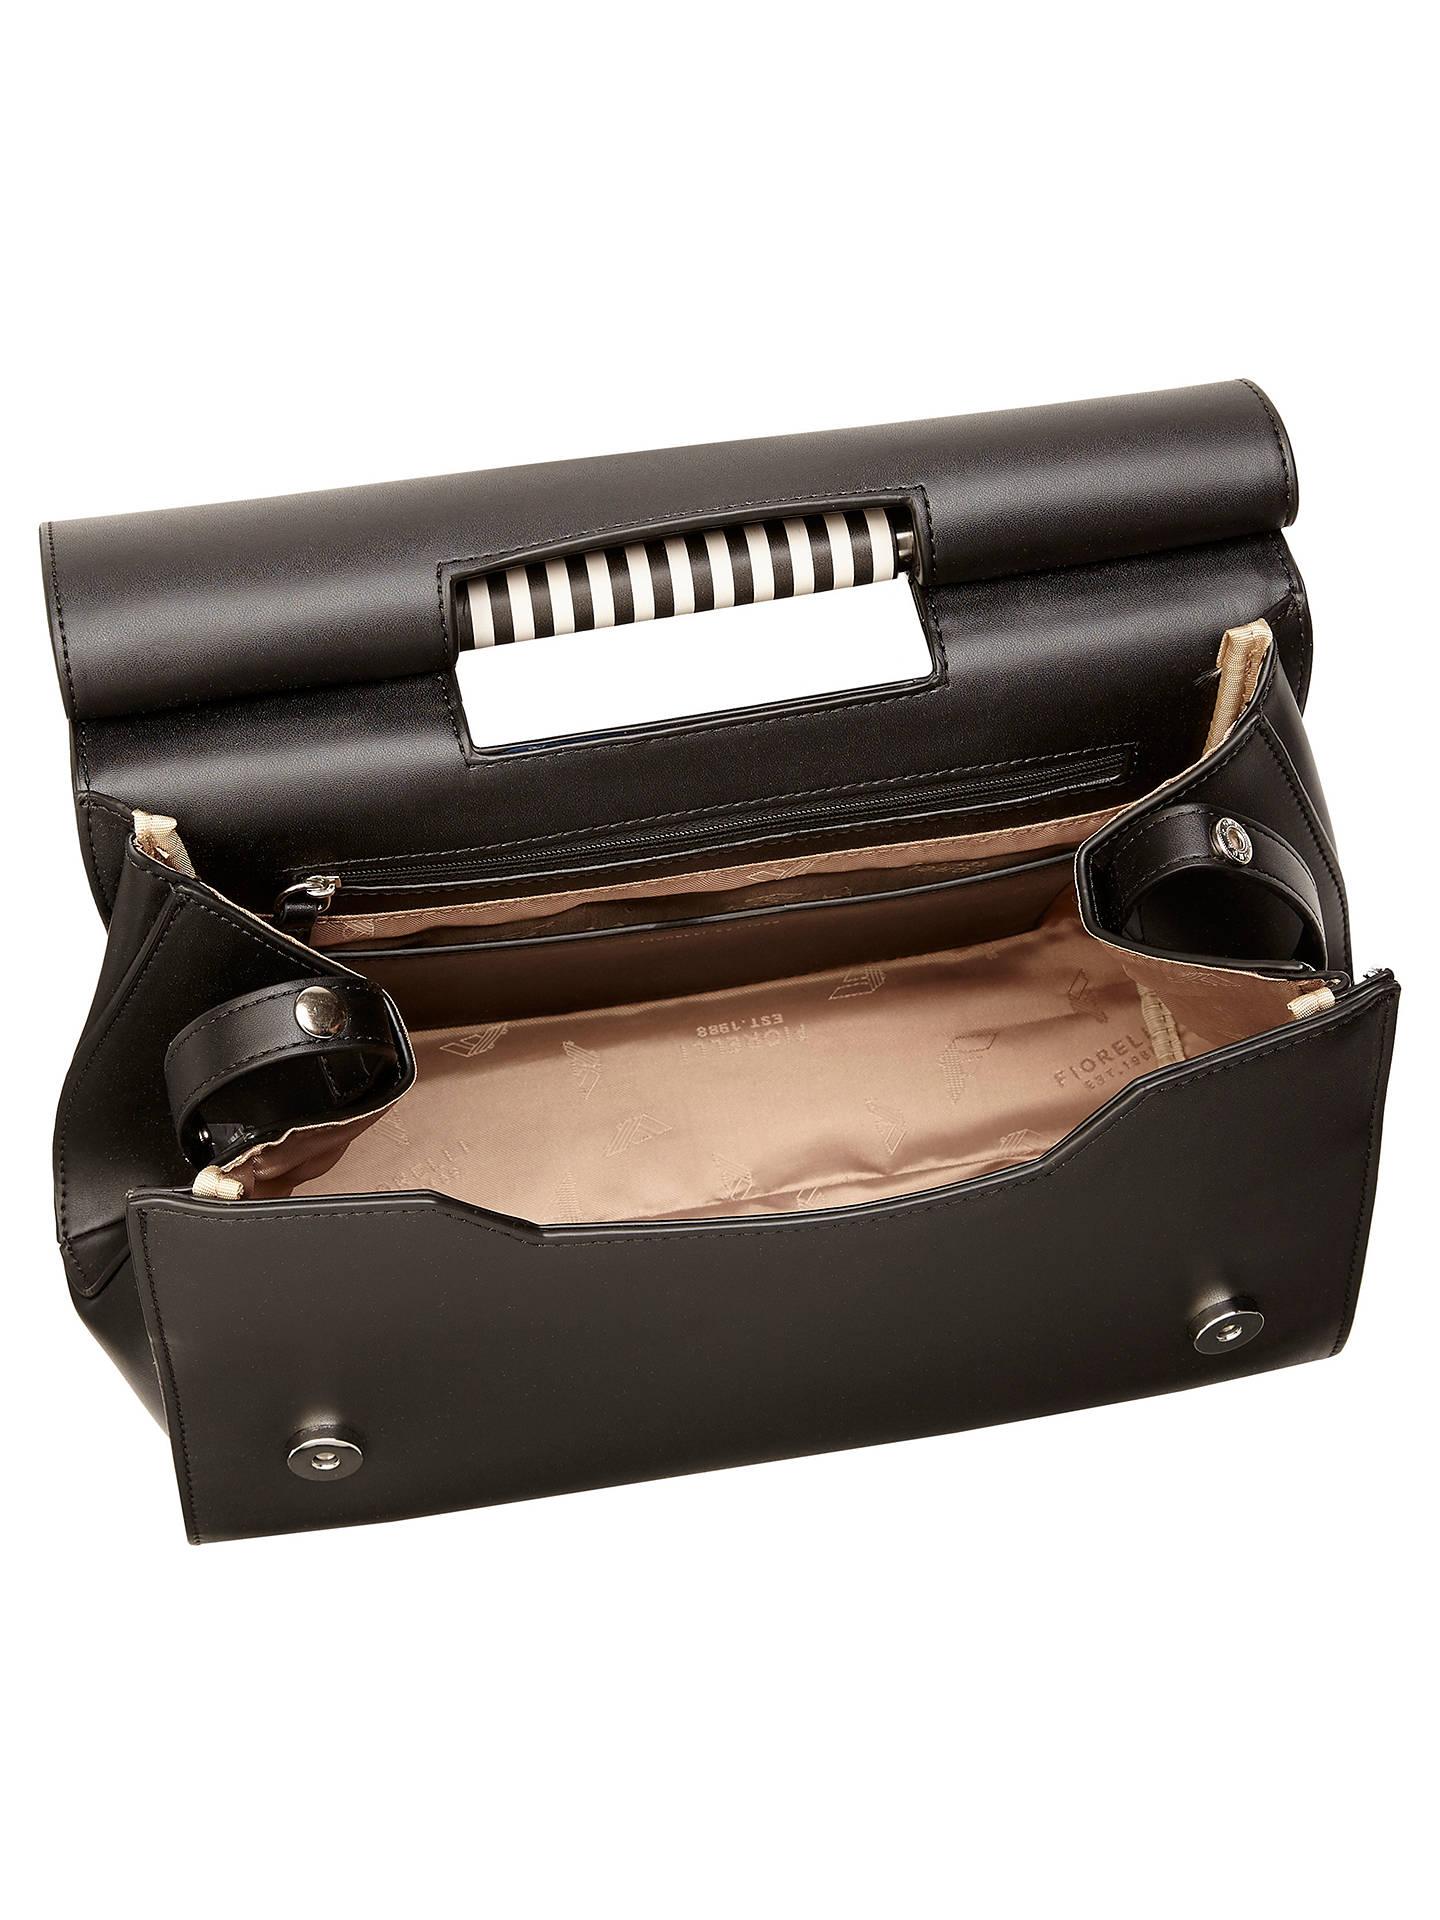 dddd15c6341d Fiorelli Austin Satchel Bag at John Lewis   Partners